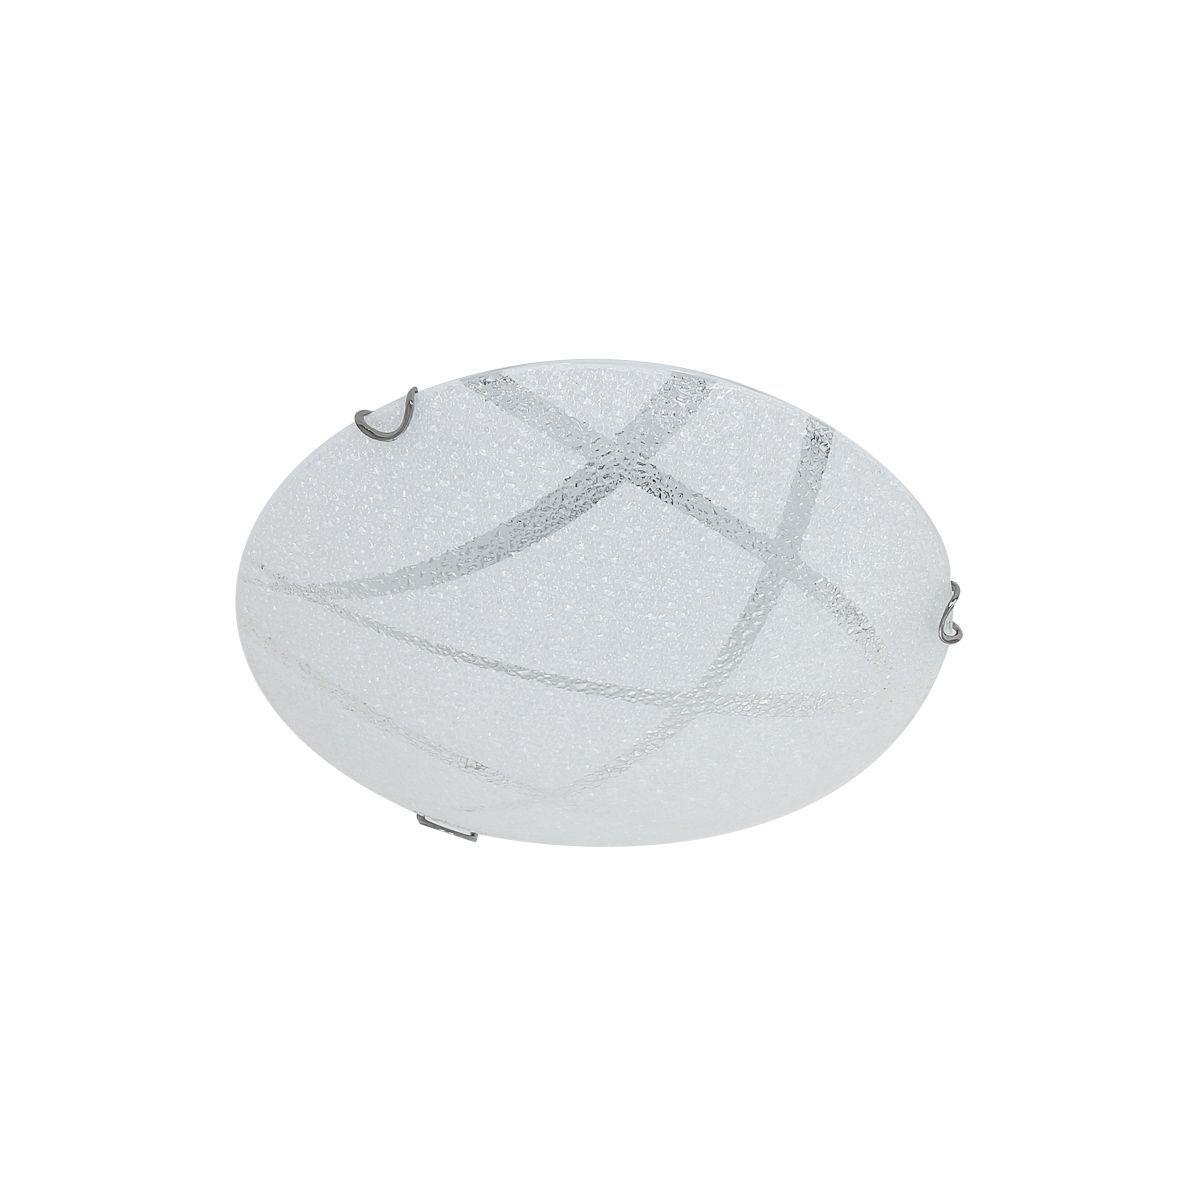 ITALUX LAMPA PLAFON LED FABIA M-D89024-12W